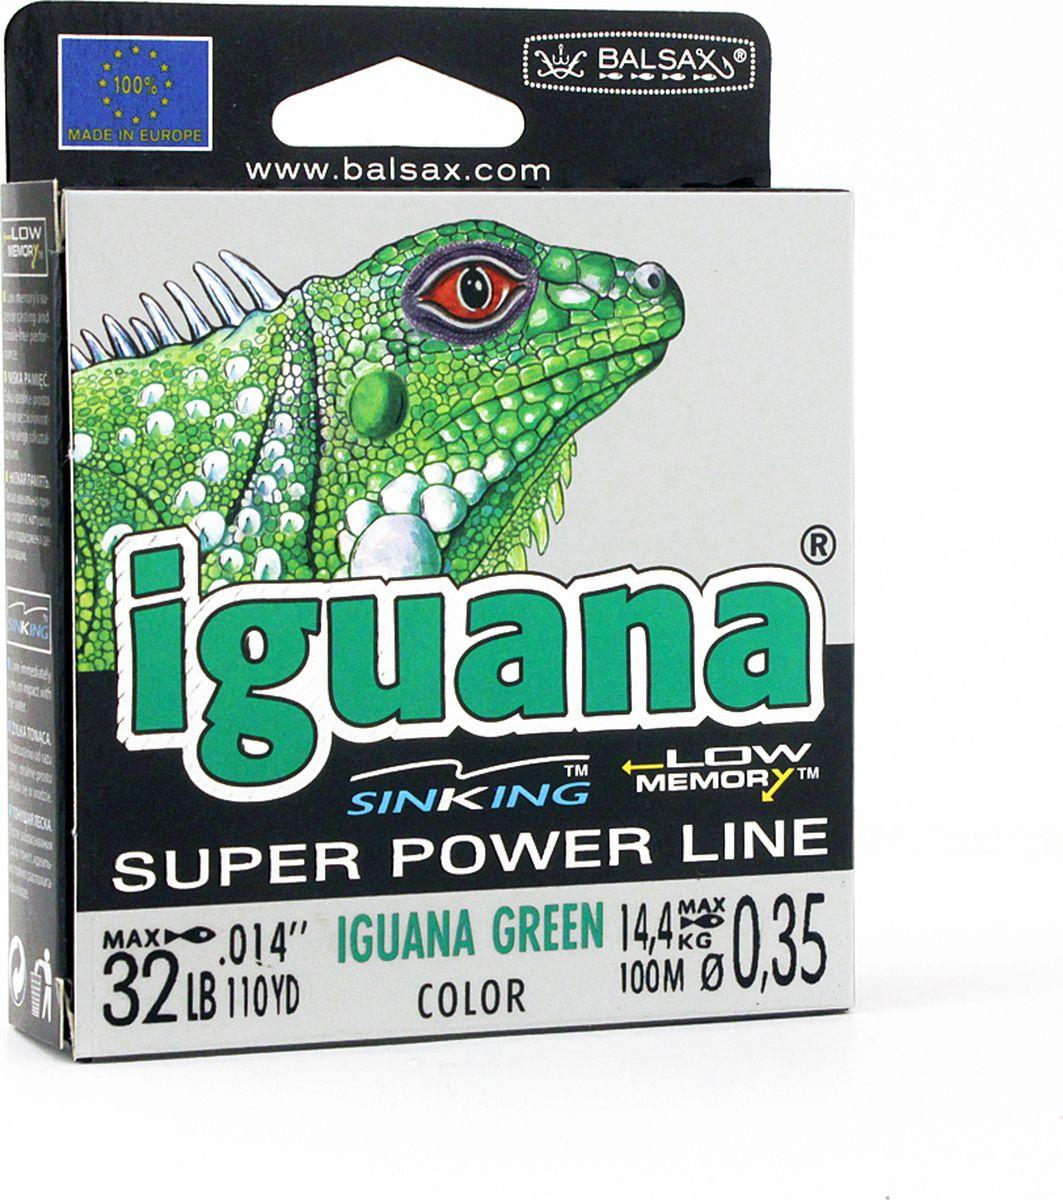 Леска Balsax Iguana, 100 м, 0,35 мм, 14,4 кг